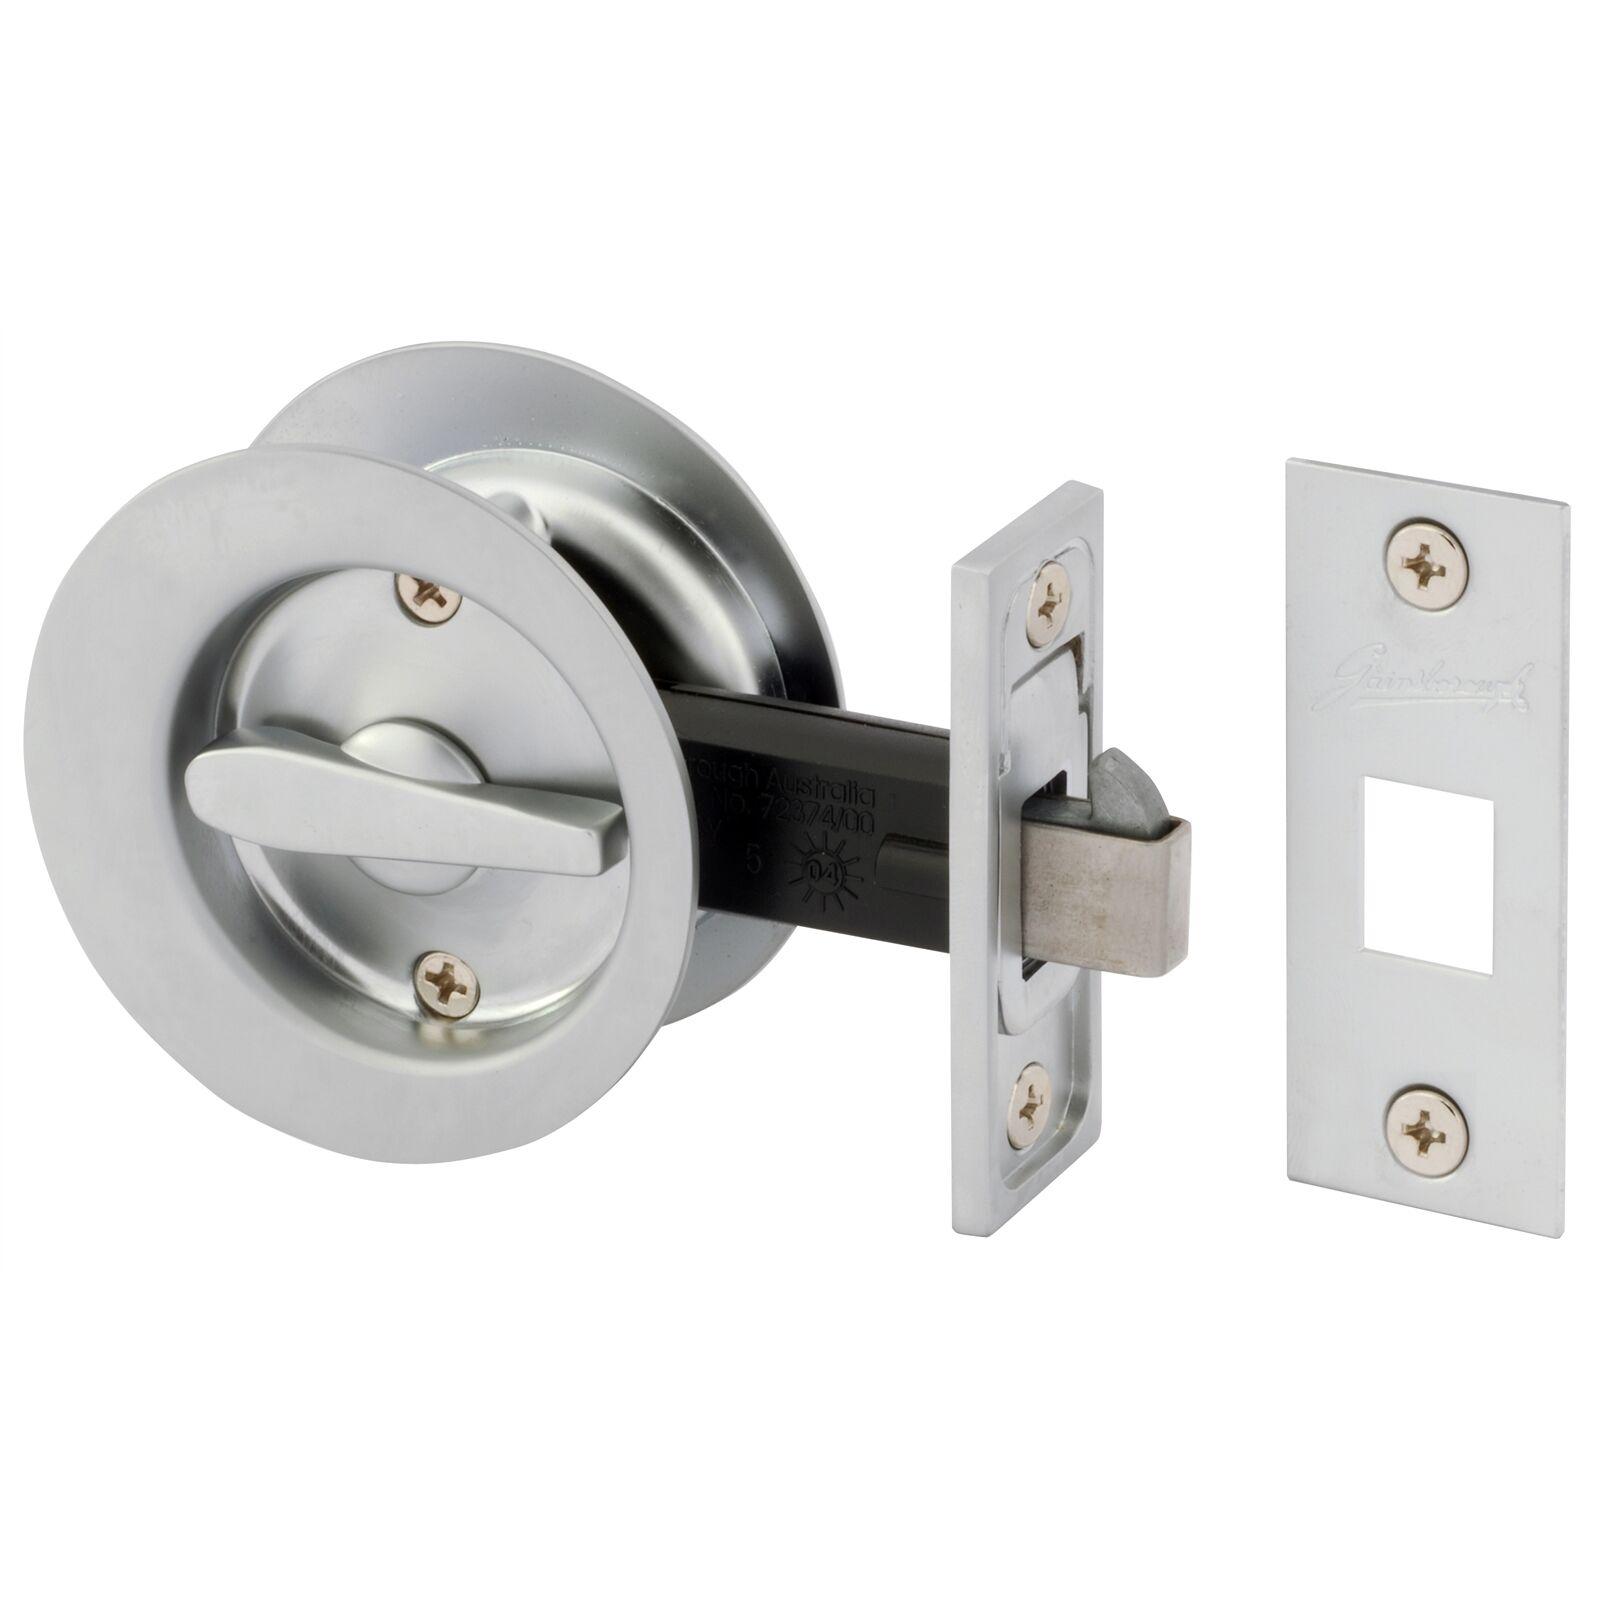 Gainsborough SLIDING CAVITY PRIVACY DOOR LOCK *AUS Brand- Sa